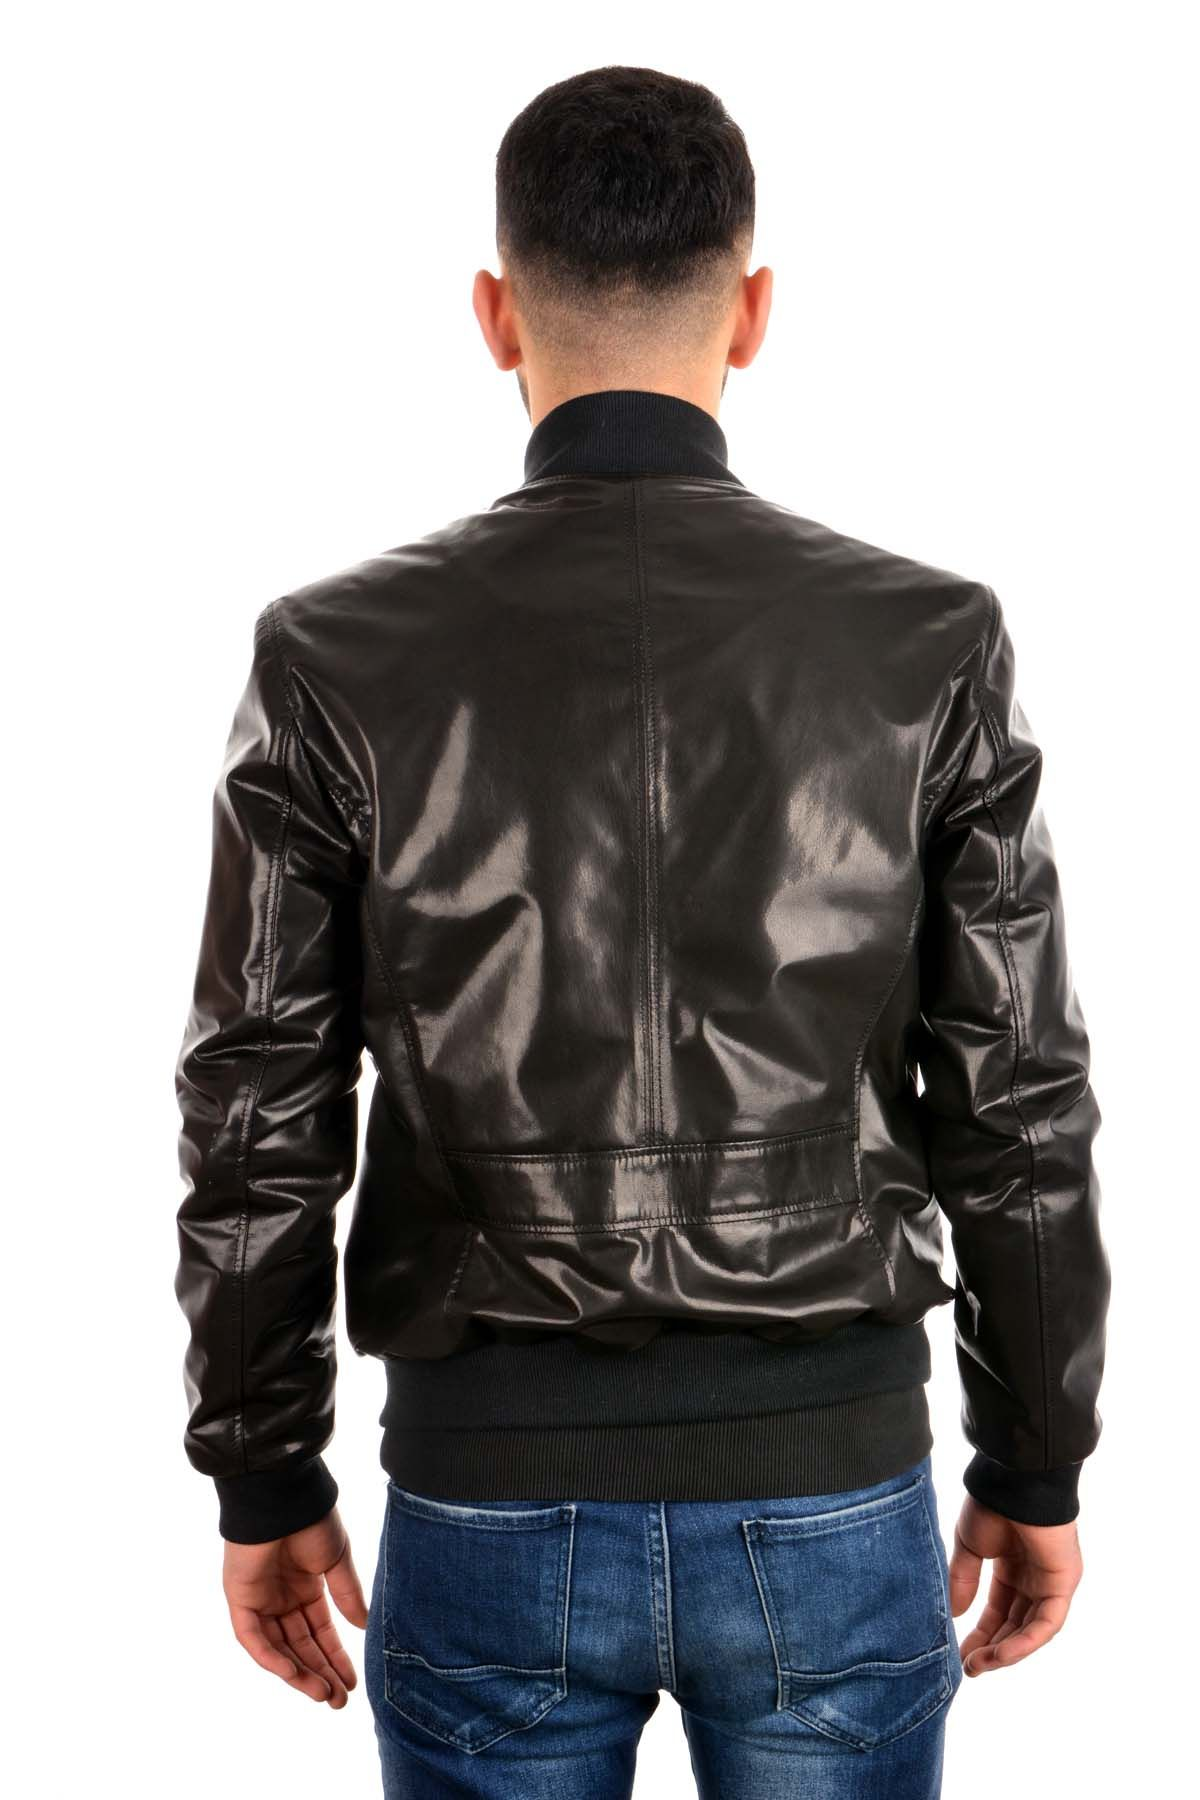 Pegia Hakiki Deri Fermuar Detaylı Erkek Ceket 17CE28 Siyah